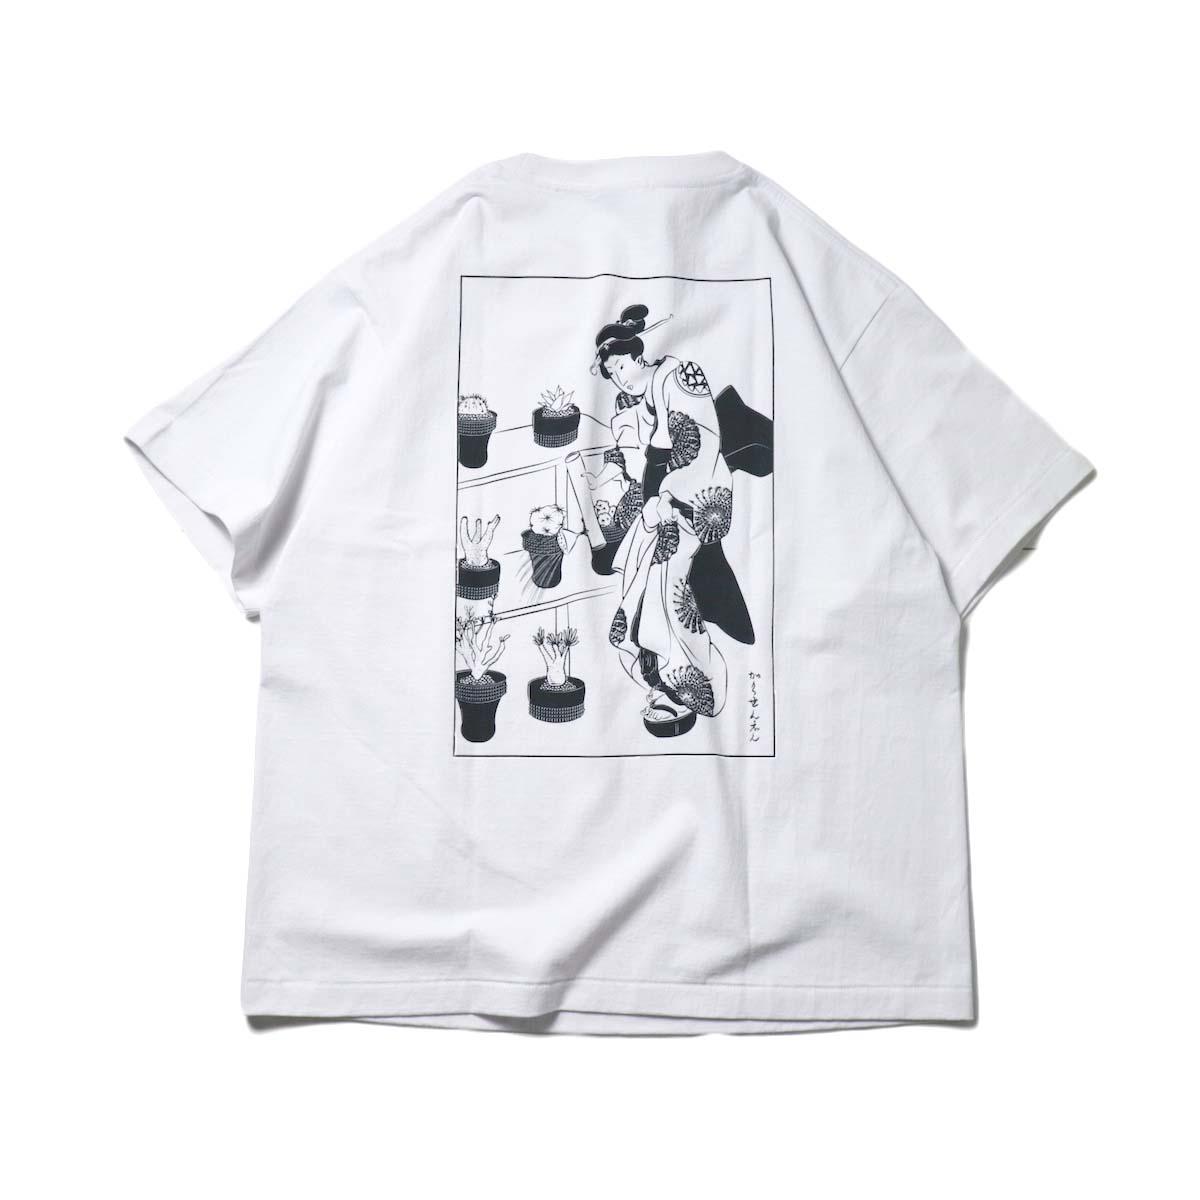 F-LAGSTUF-F × 鶴仙園 × Spycygem / Cactus Tee (White)